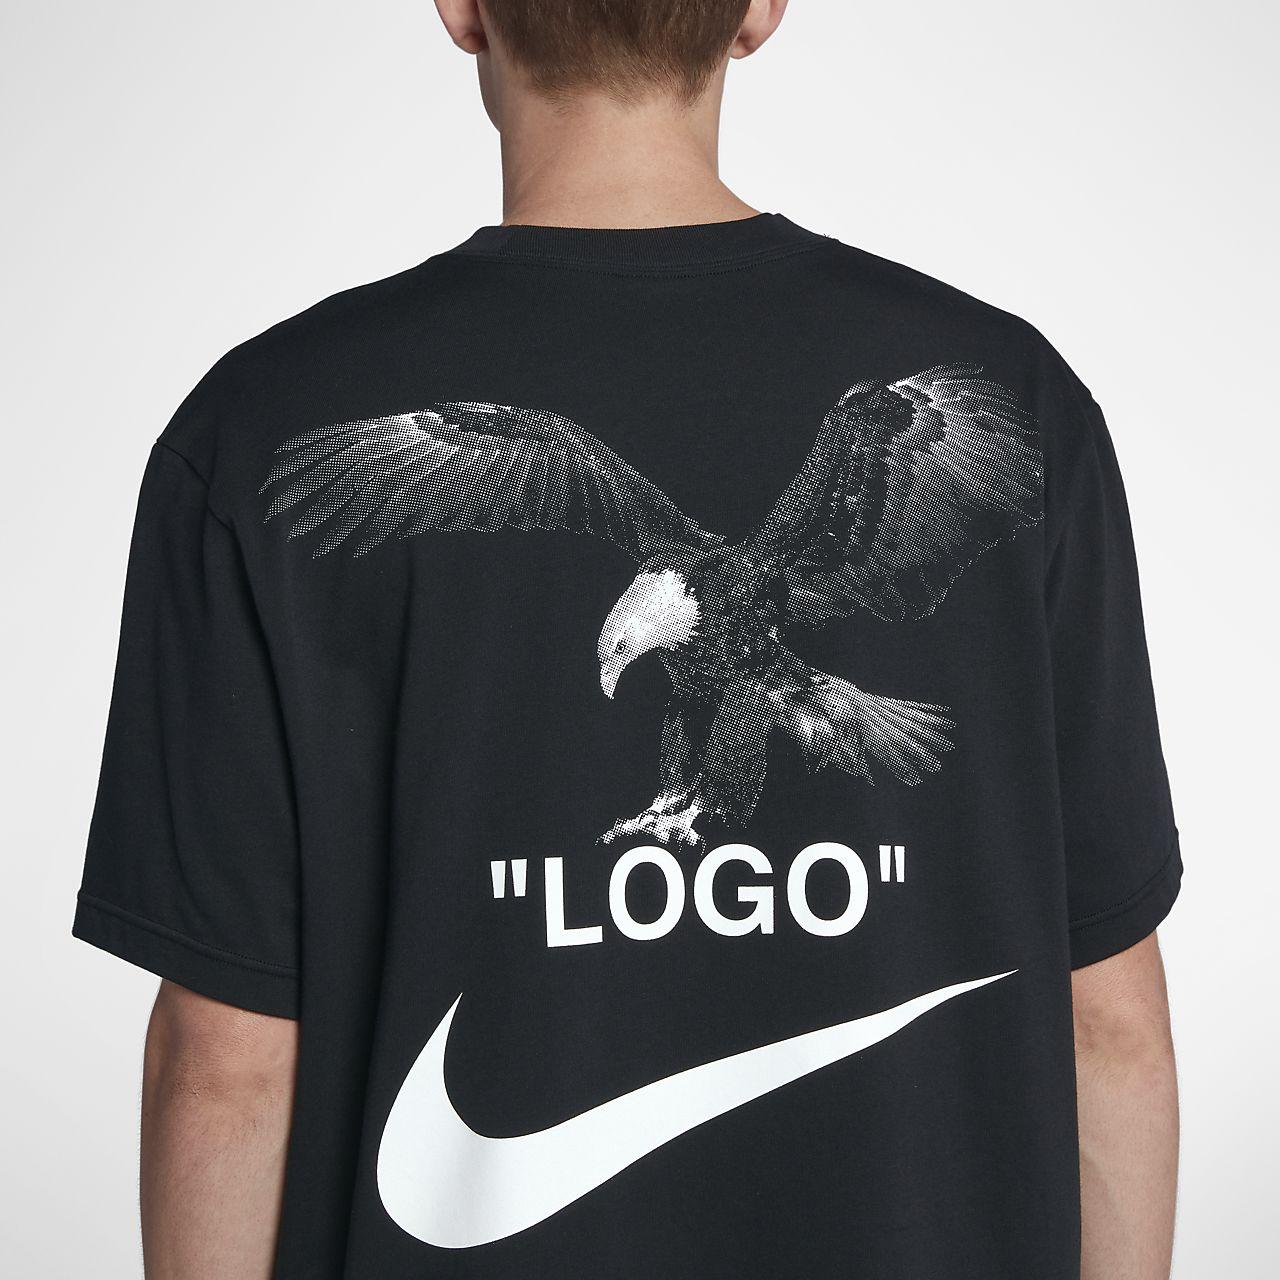 off white nike shirt logo